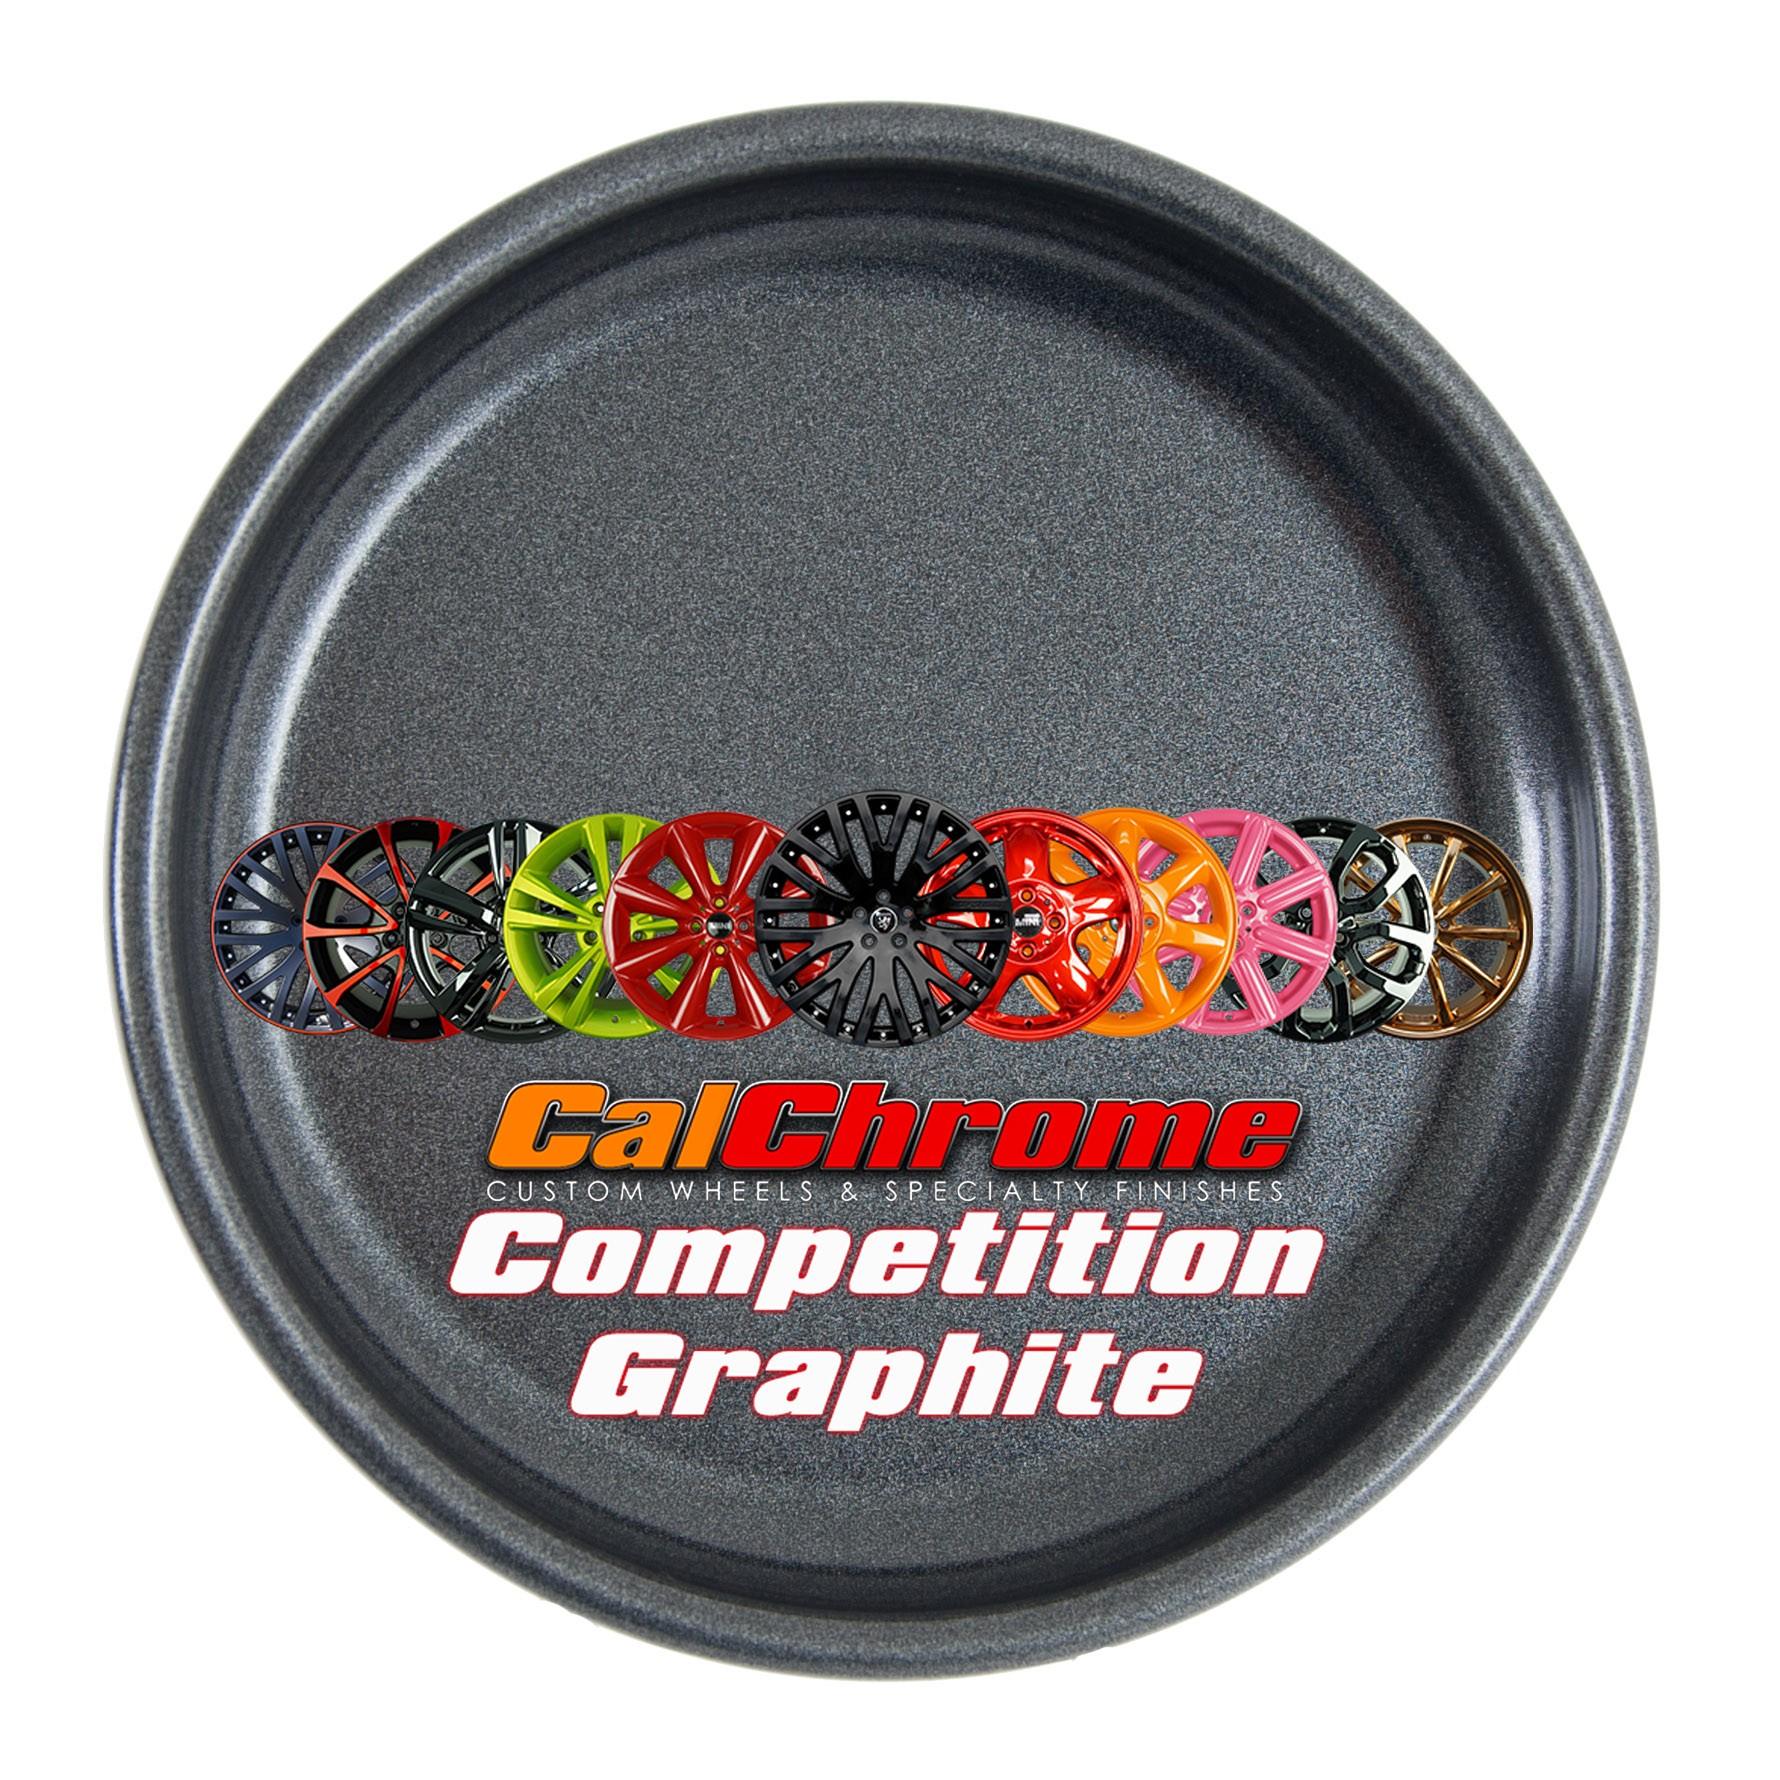 Competition Graphite Fusion Powder Coat Wheels Rims